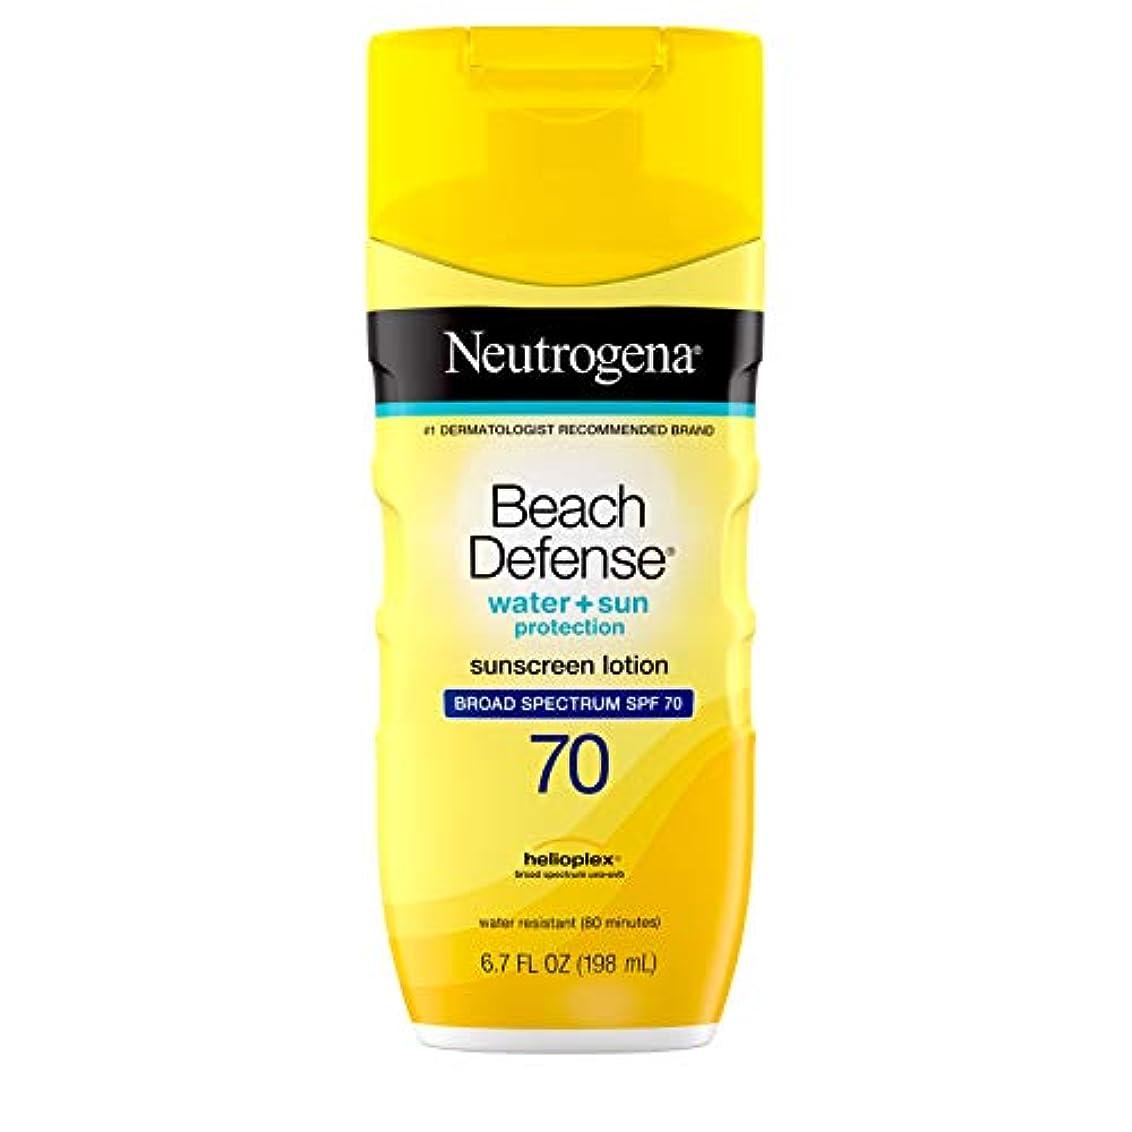 祝福する展望台予報海外直送品Neutrogena Neutrogena Beach Defense Lotion SPF 70, 6.7 oz